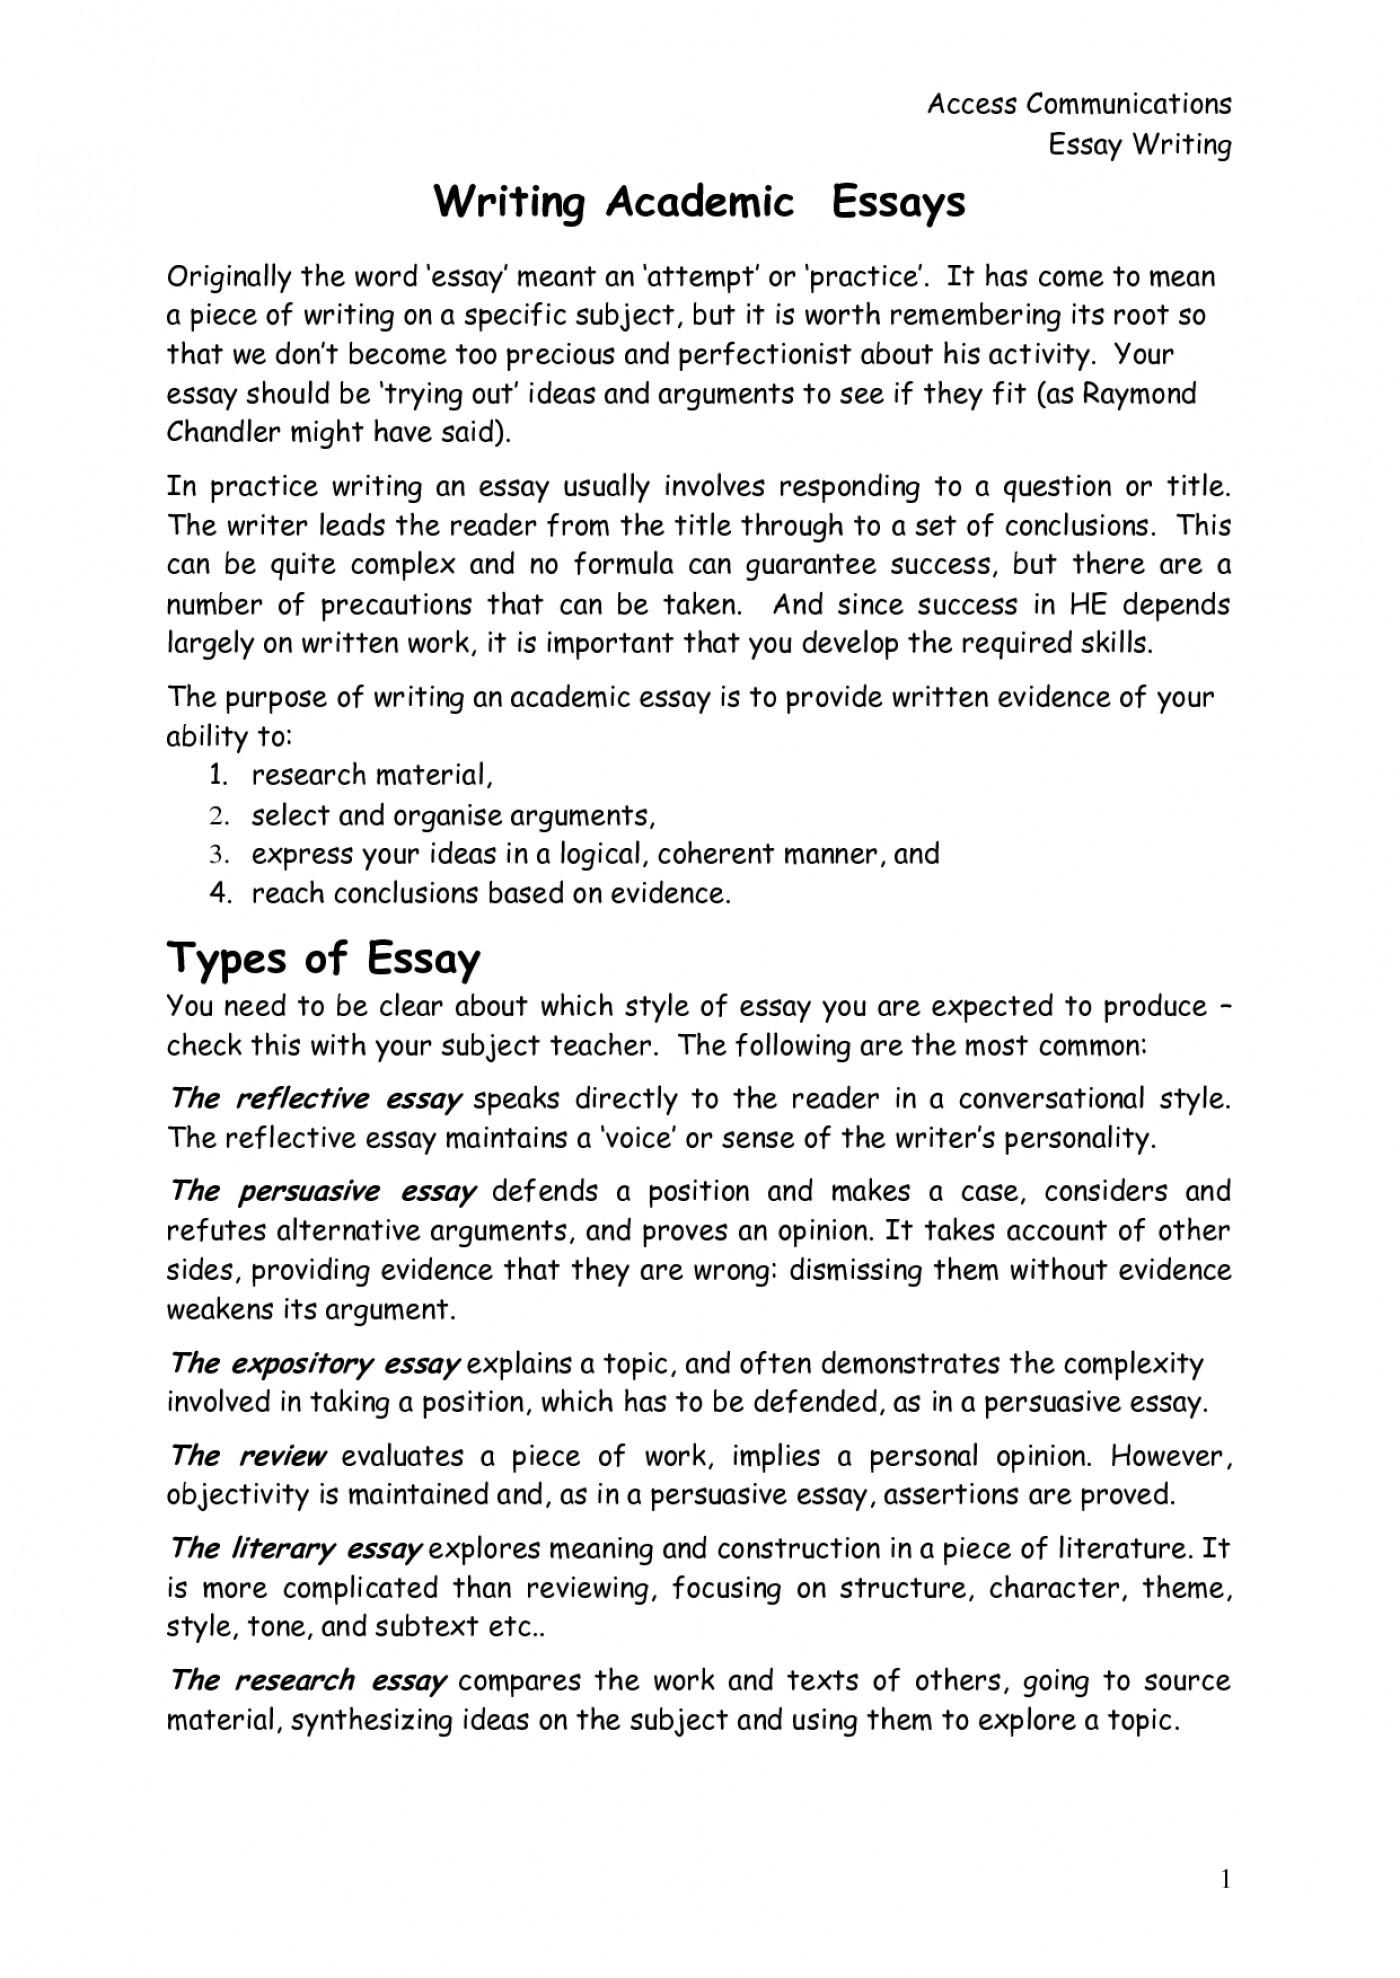 009 Reflective Essay Introduction Example Unbelievable Academic Good 1400